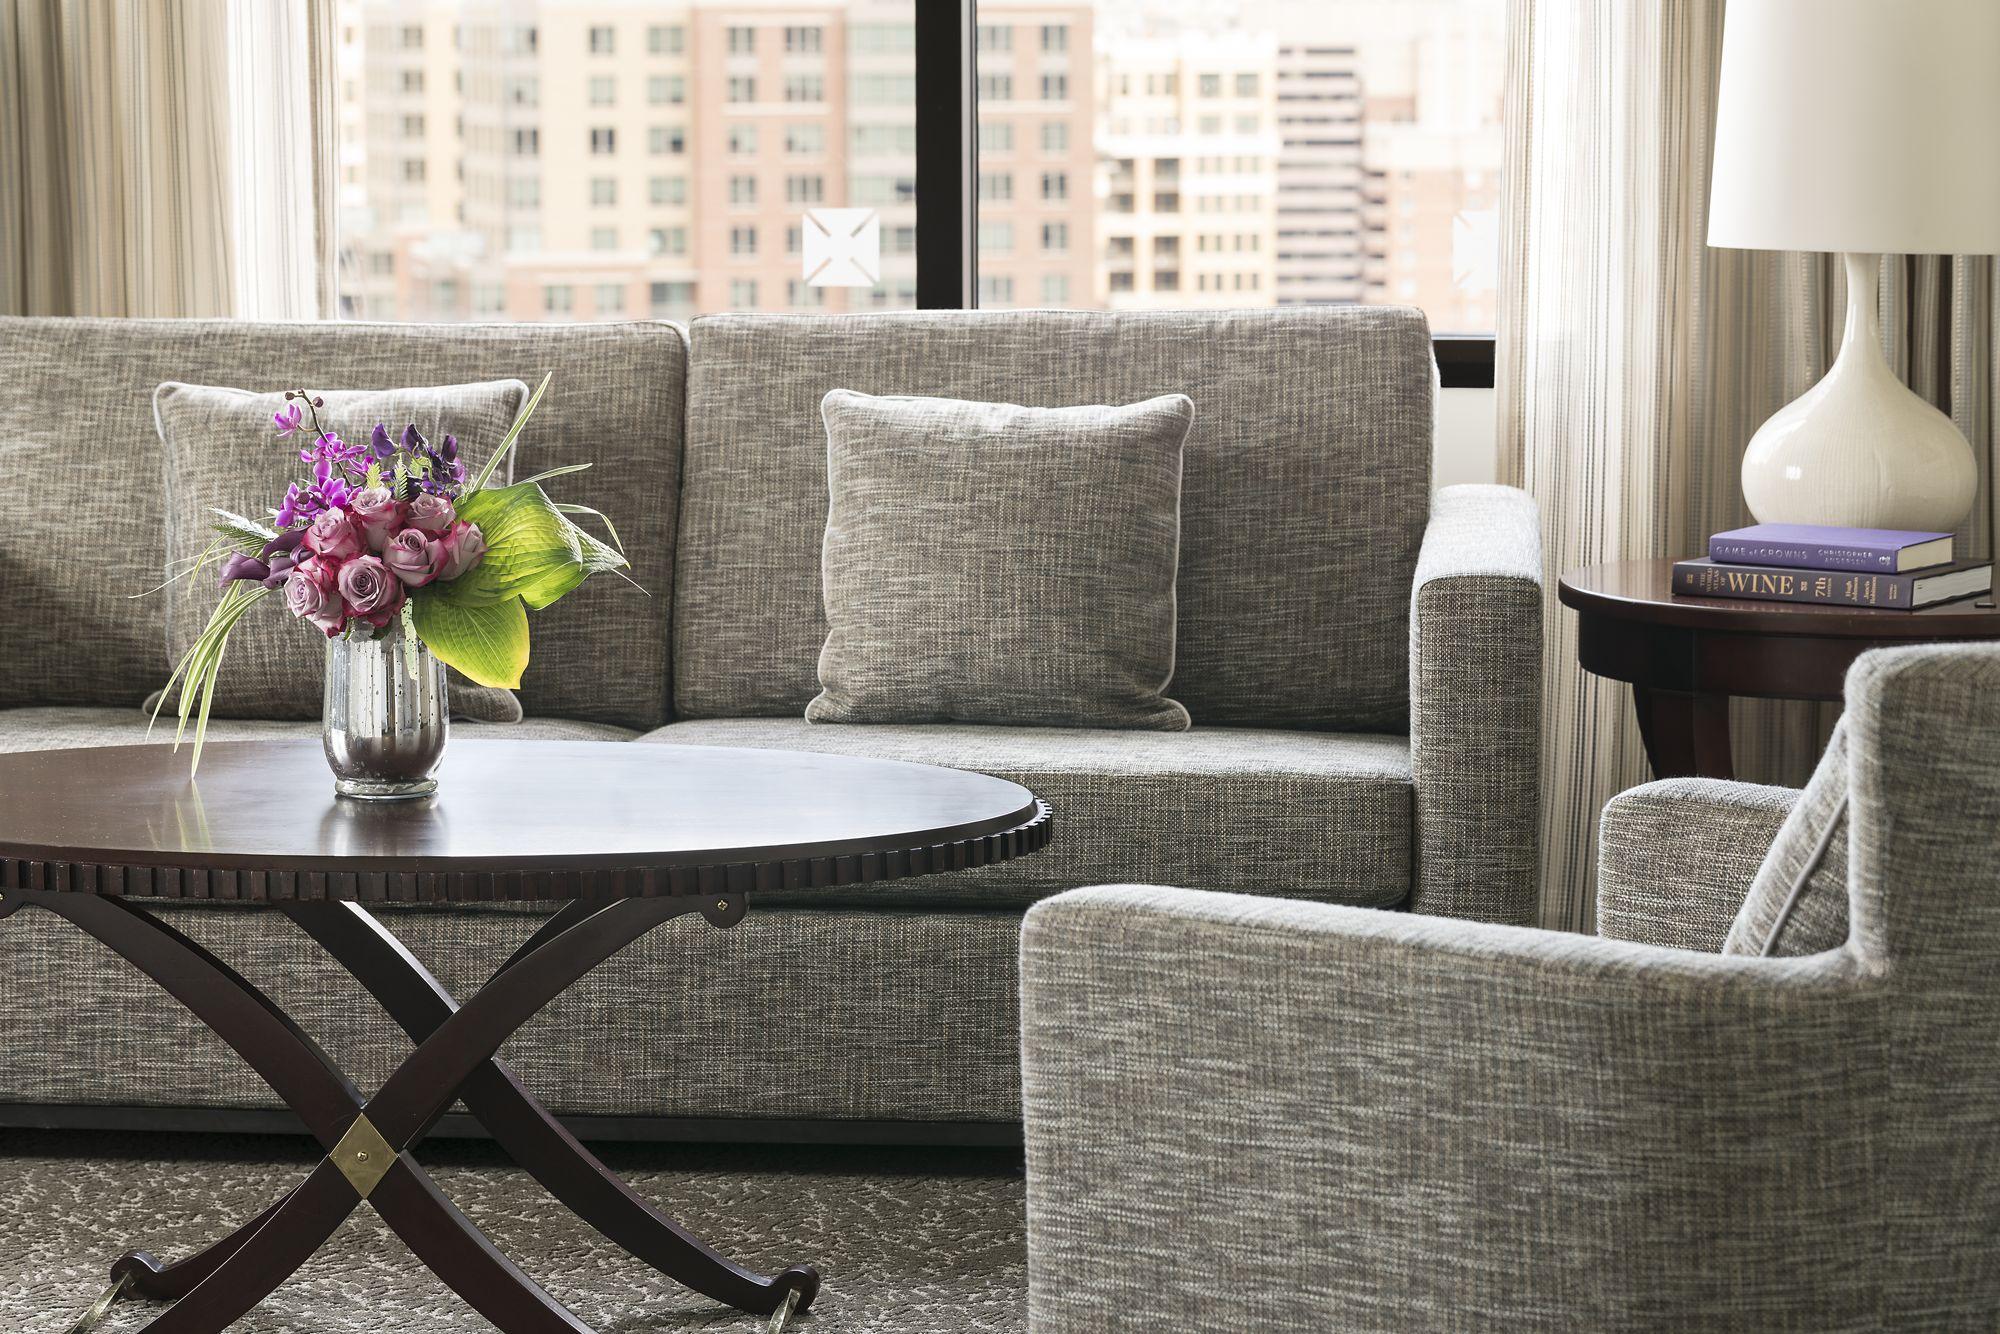 The Executive One Bedroom Suite @ Ritz-Carlton, Pentagon City